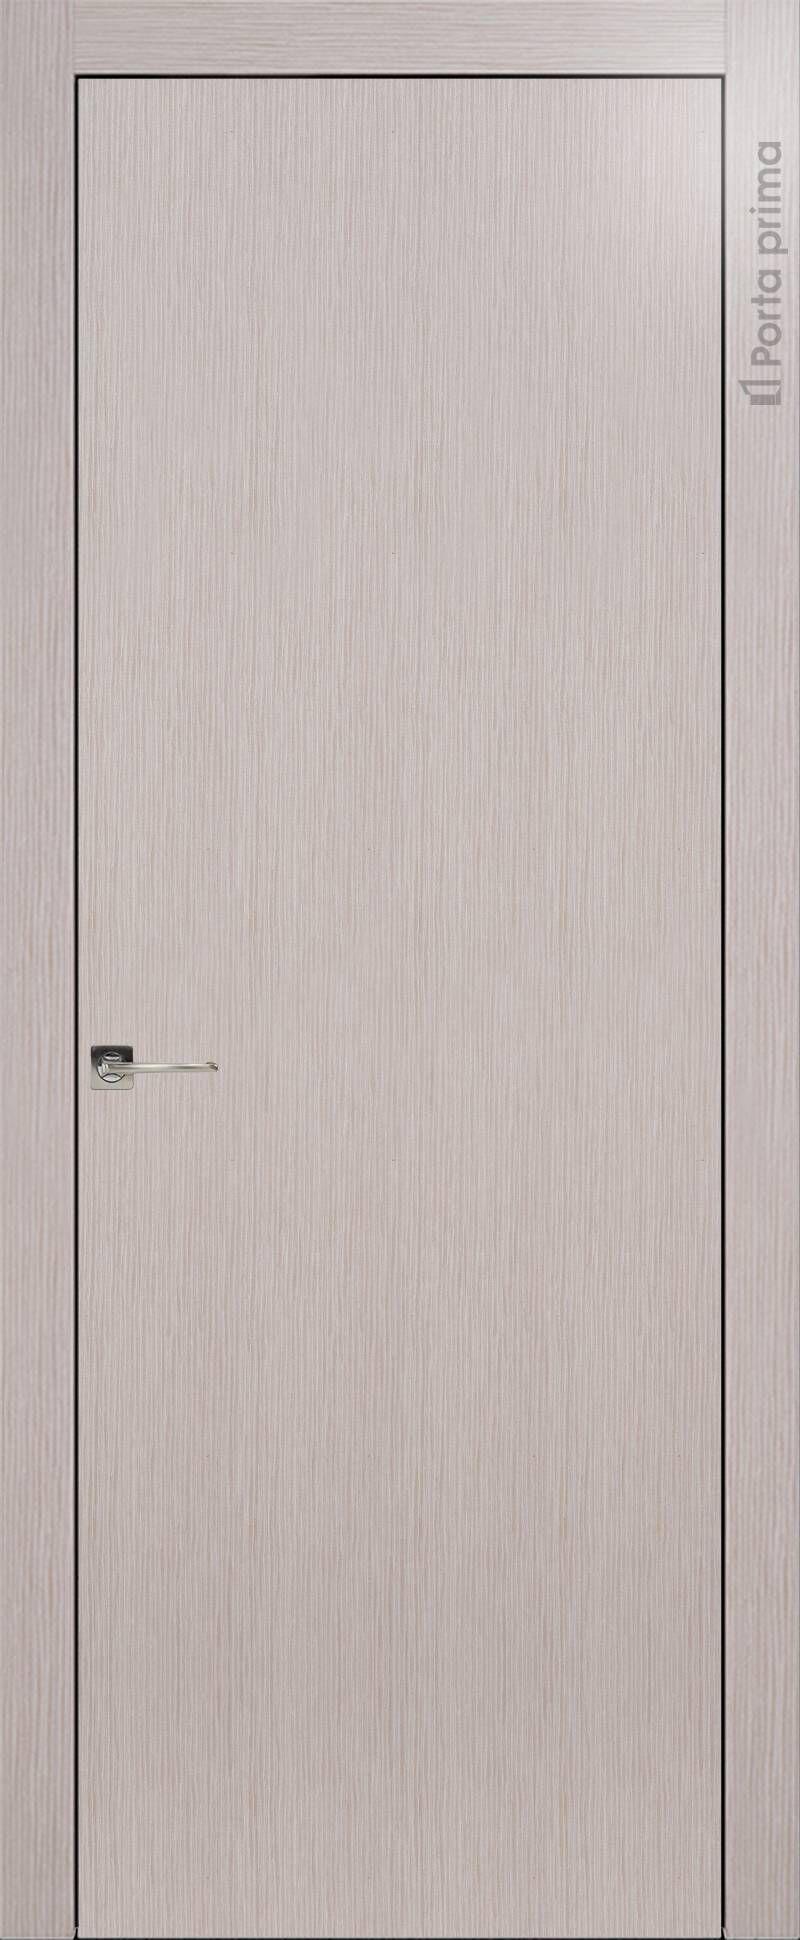 Tivoli А-1 цвет - Дымчатый дуб Без стекла (ДГ)